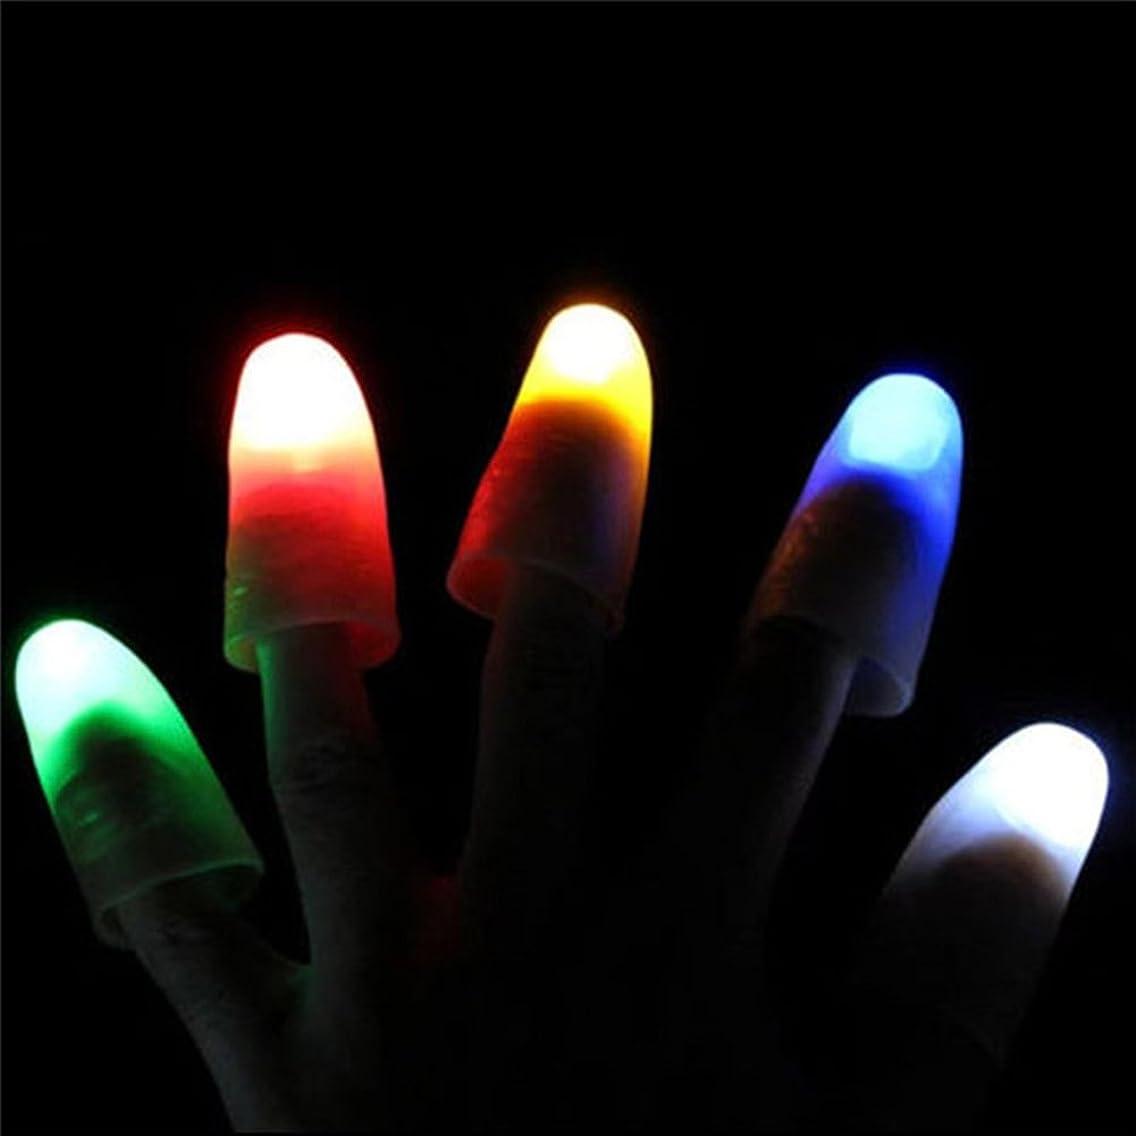 WskLinft 2Pcs Magic Super Bright Light Up Thumbs Fingers Party Club Christmas Trick - Random Color